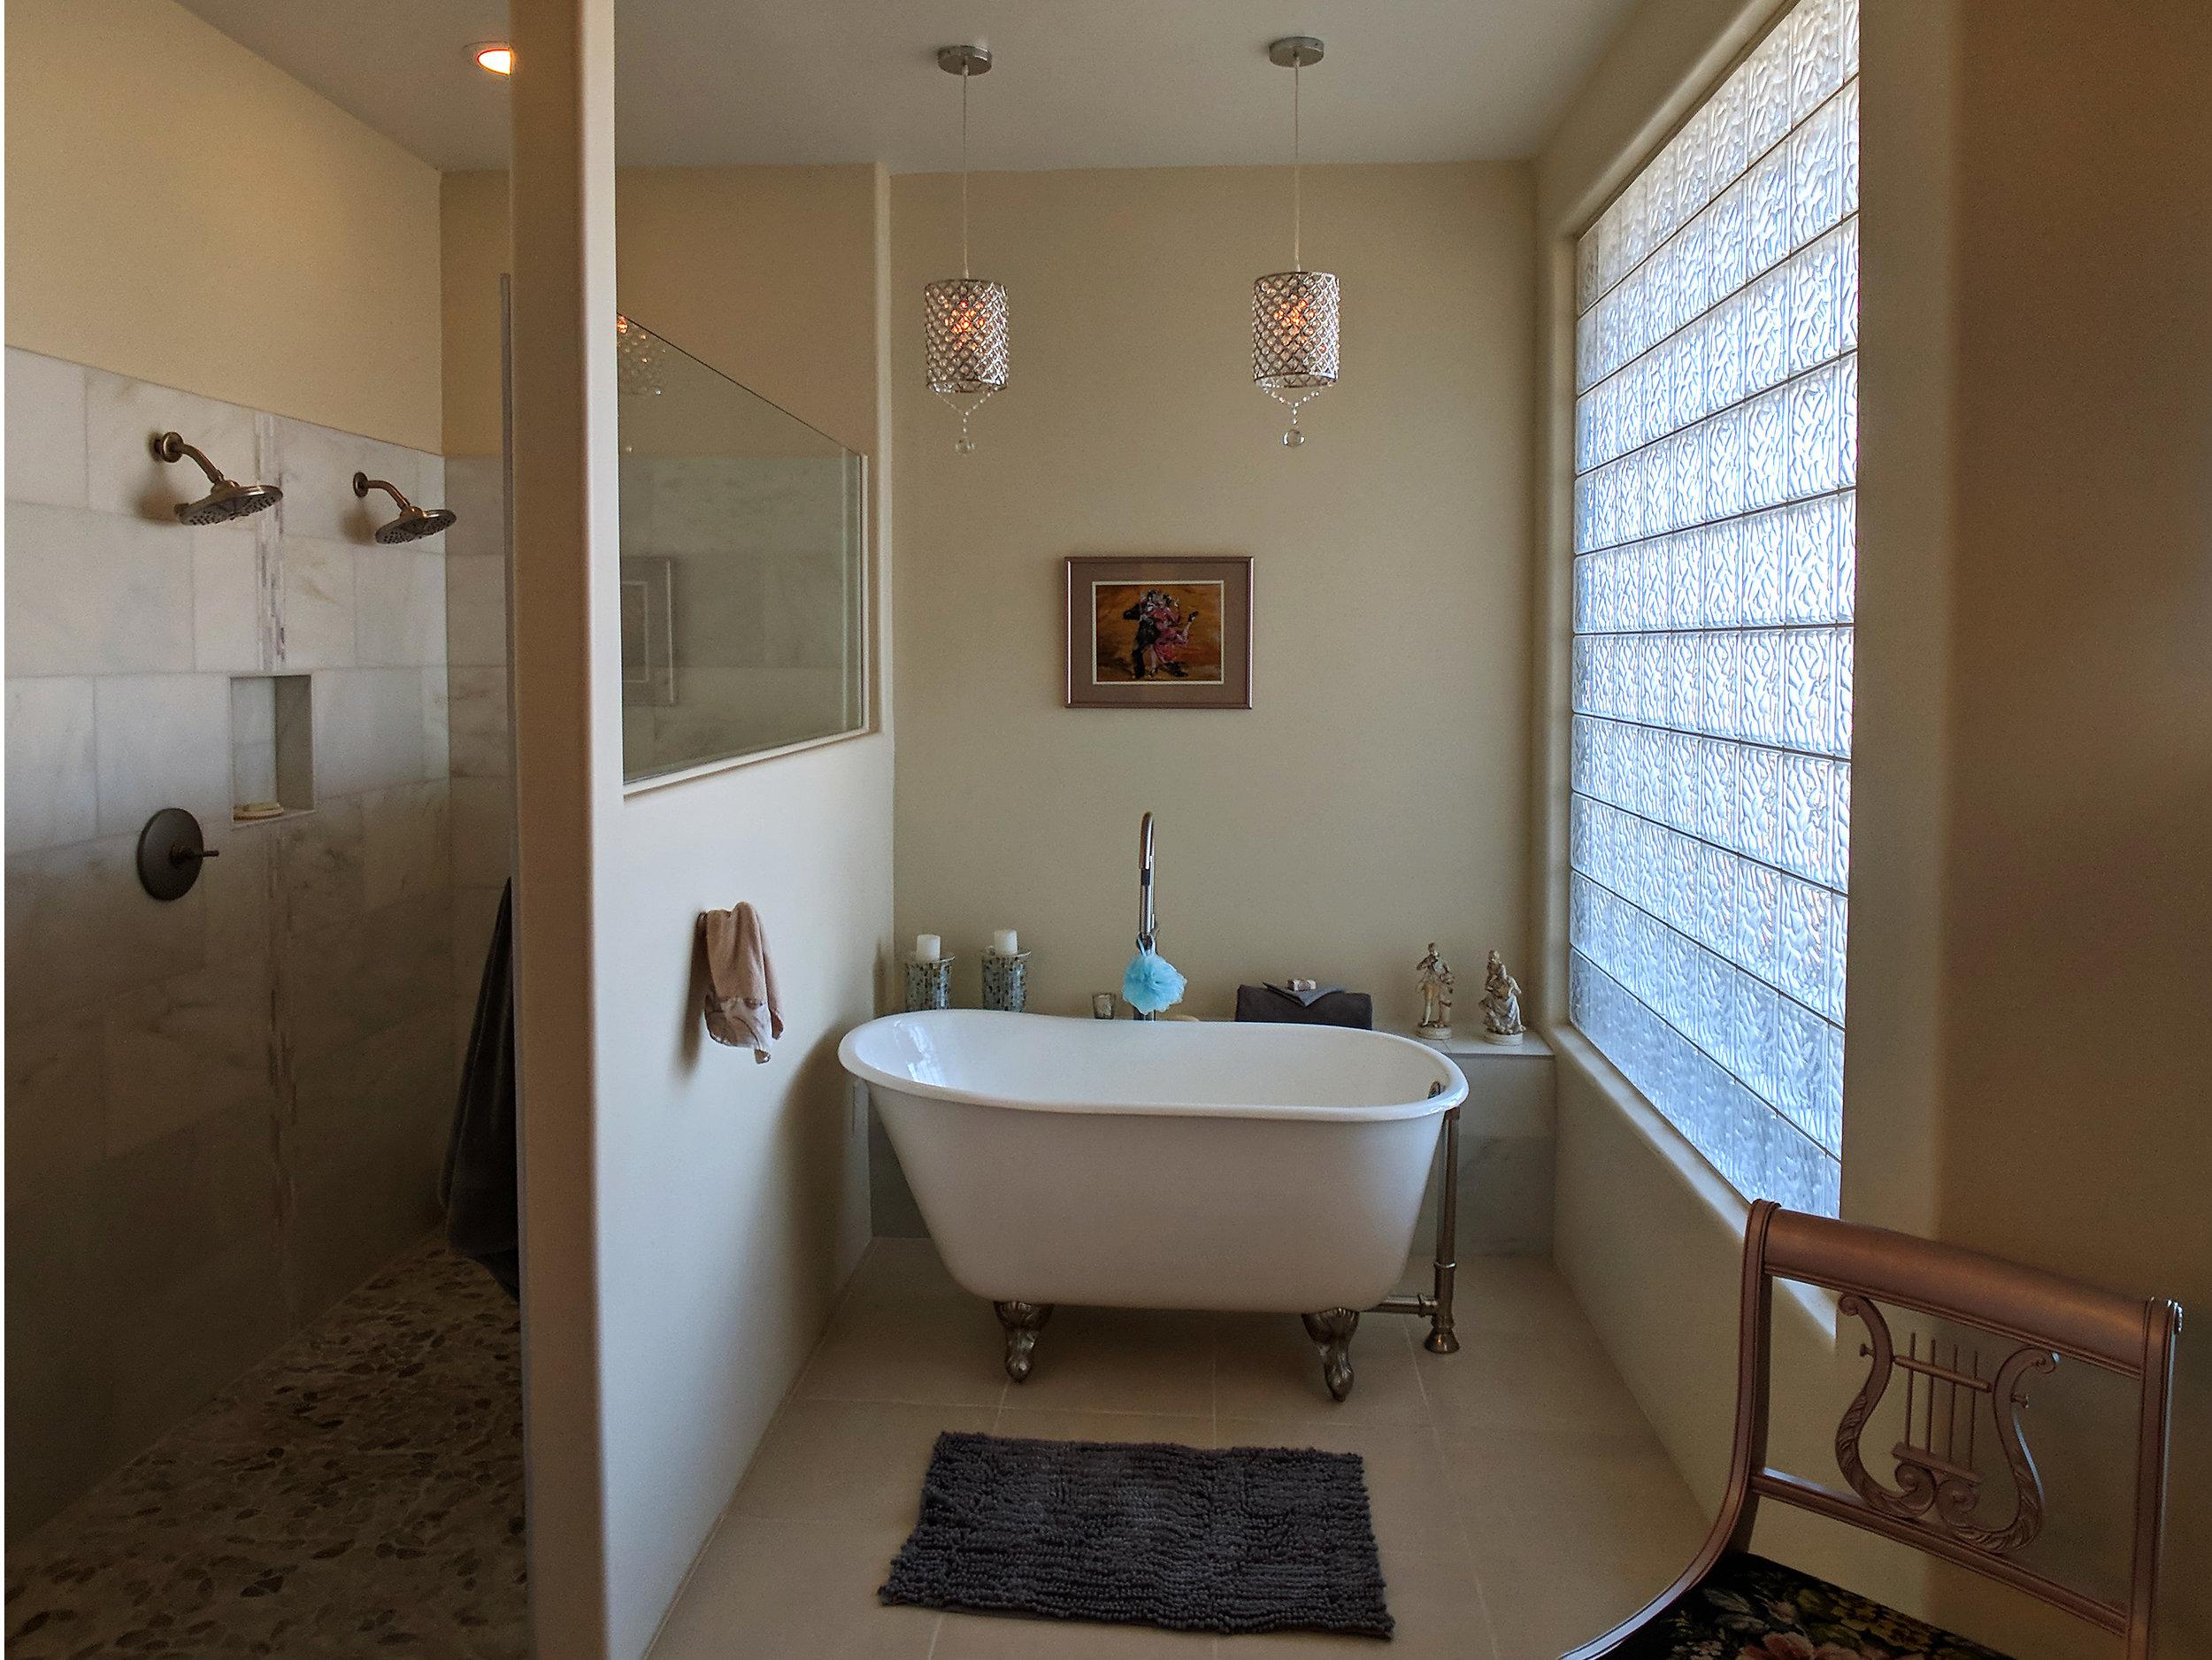 holland-bathroom-clawfoot-tub.jpg